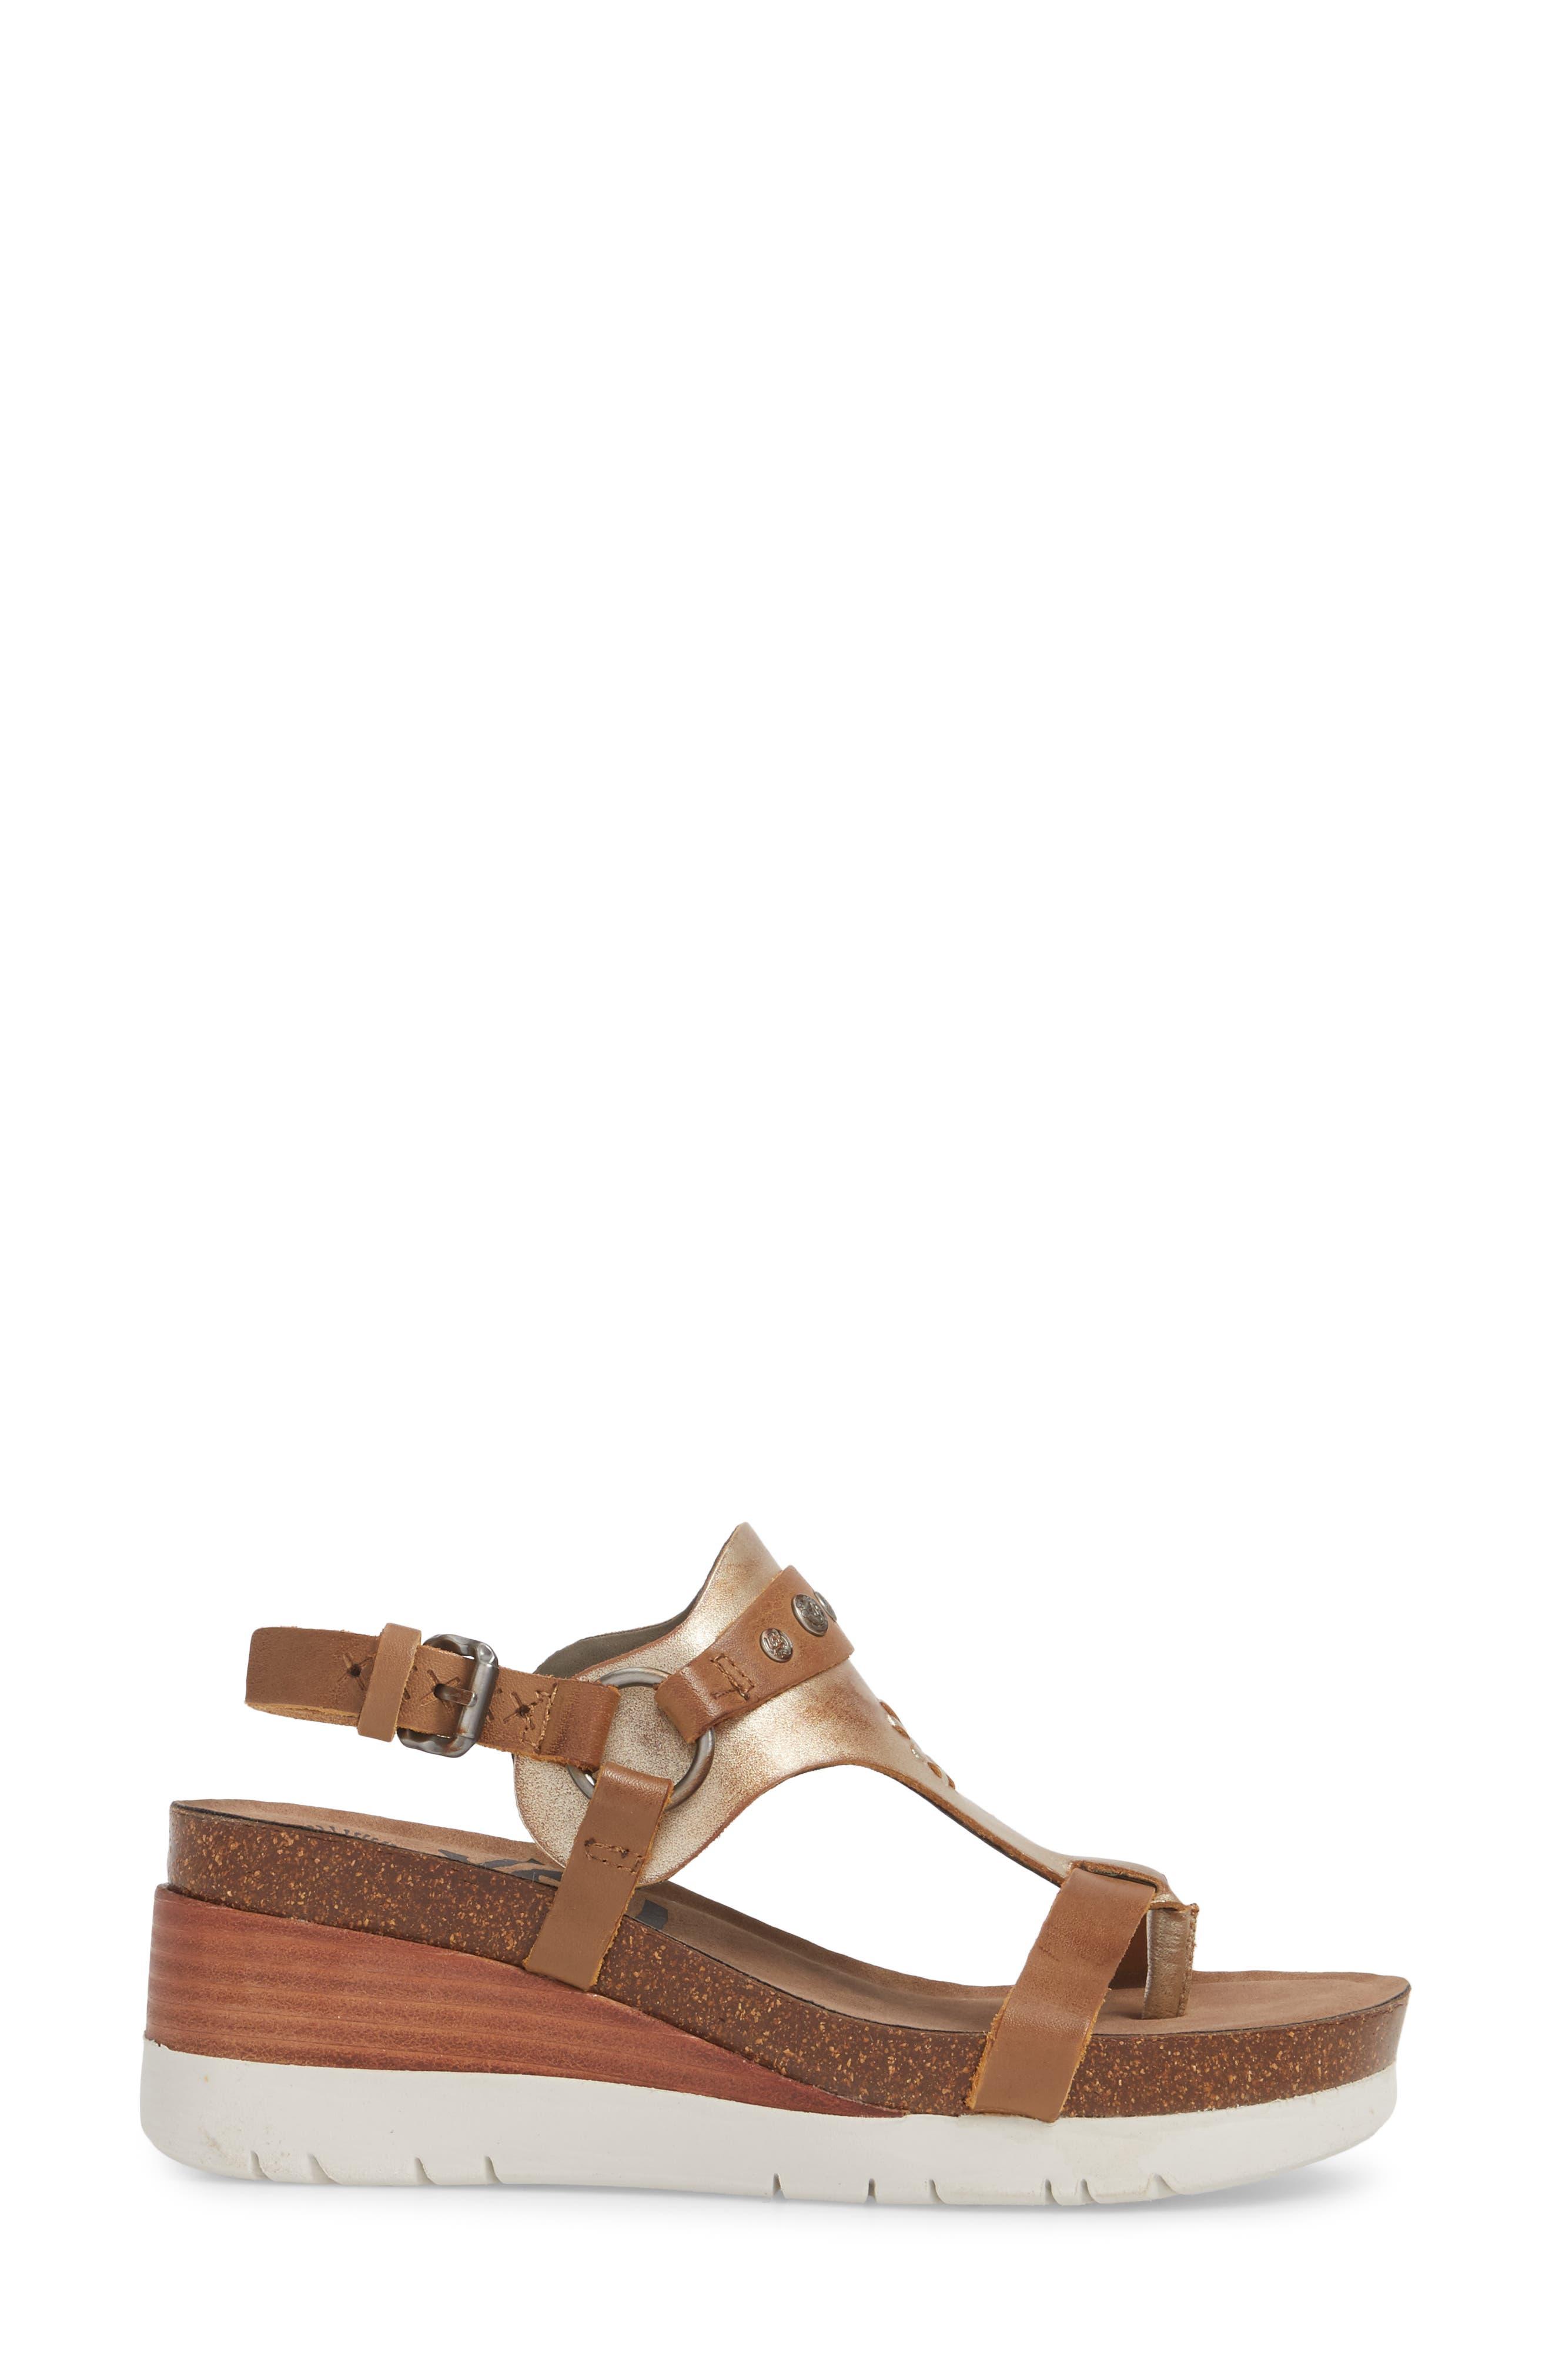 Maverick Wedge Sandal,                             Alternate thumbnail 3, color,                             New Taupe Leather